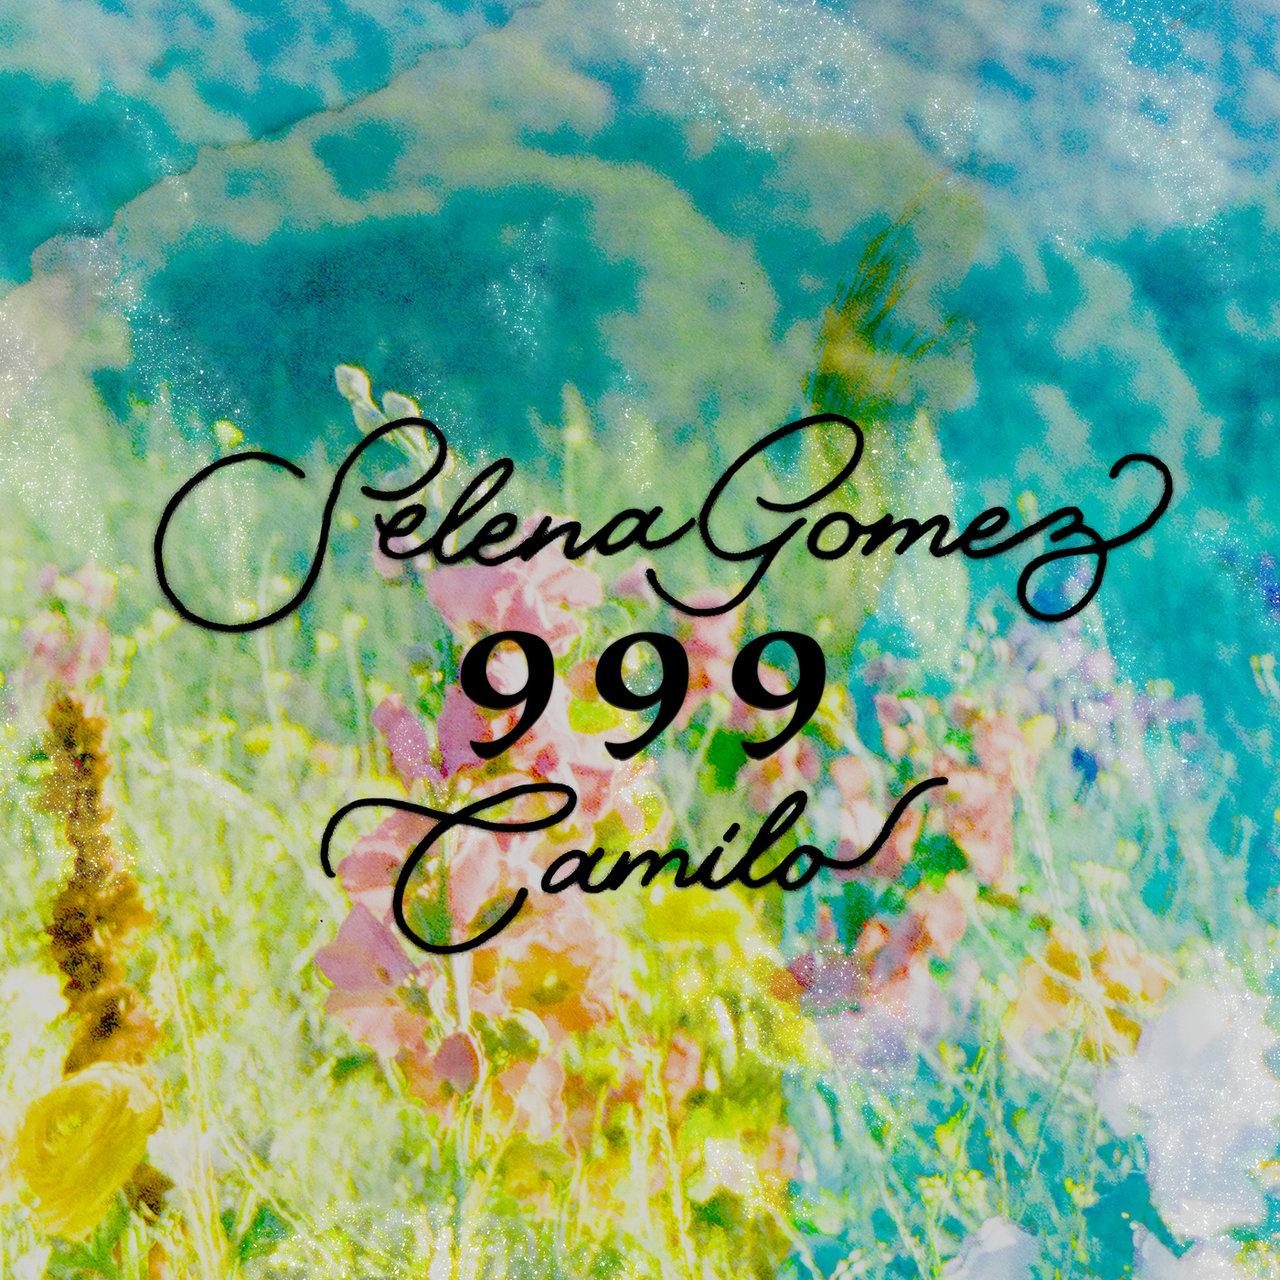 Selena Gomez - 999 (ft. Camilo) (Cover)